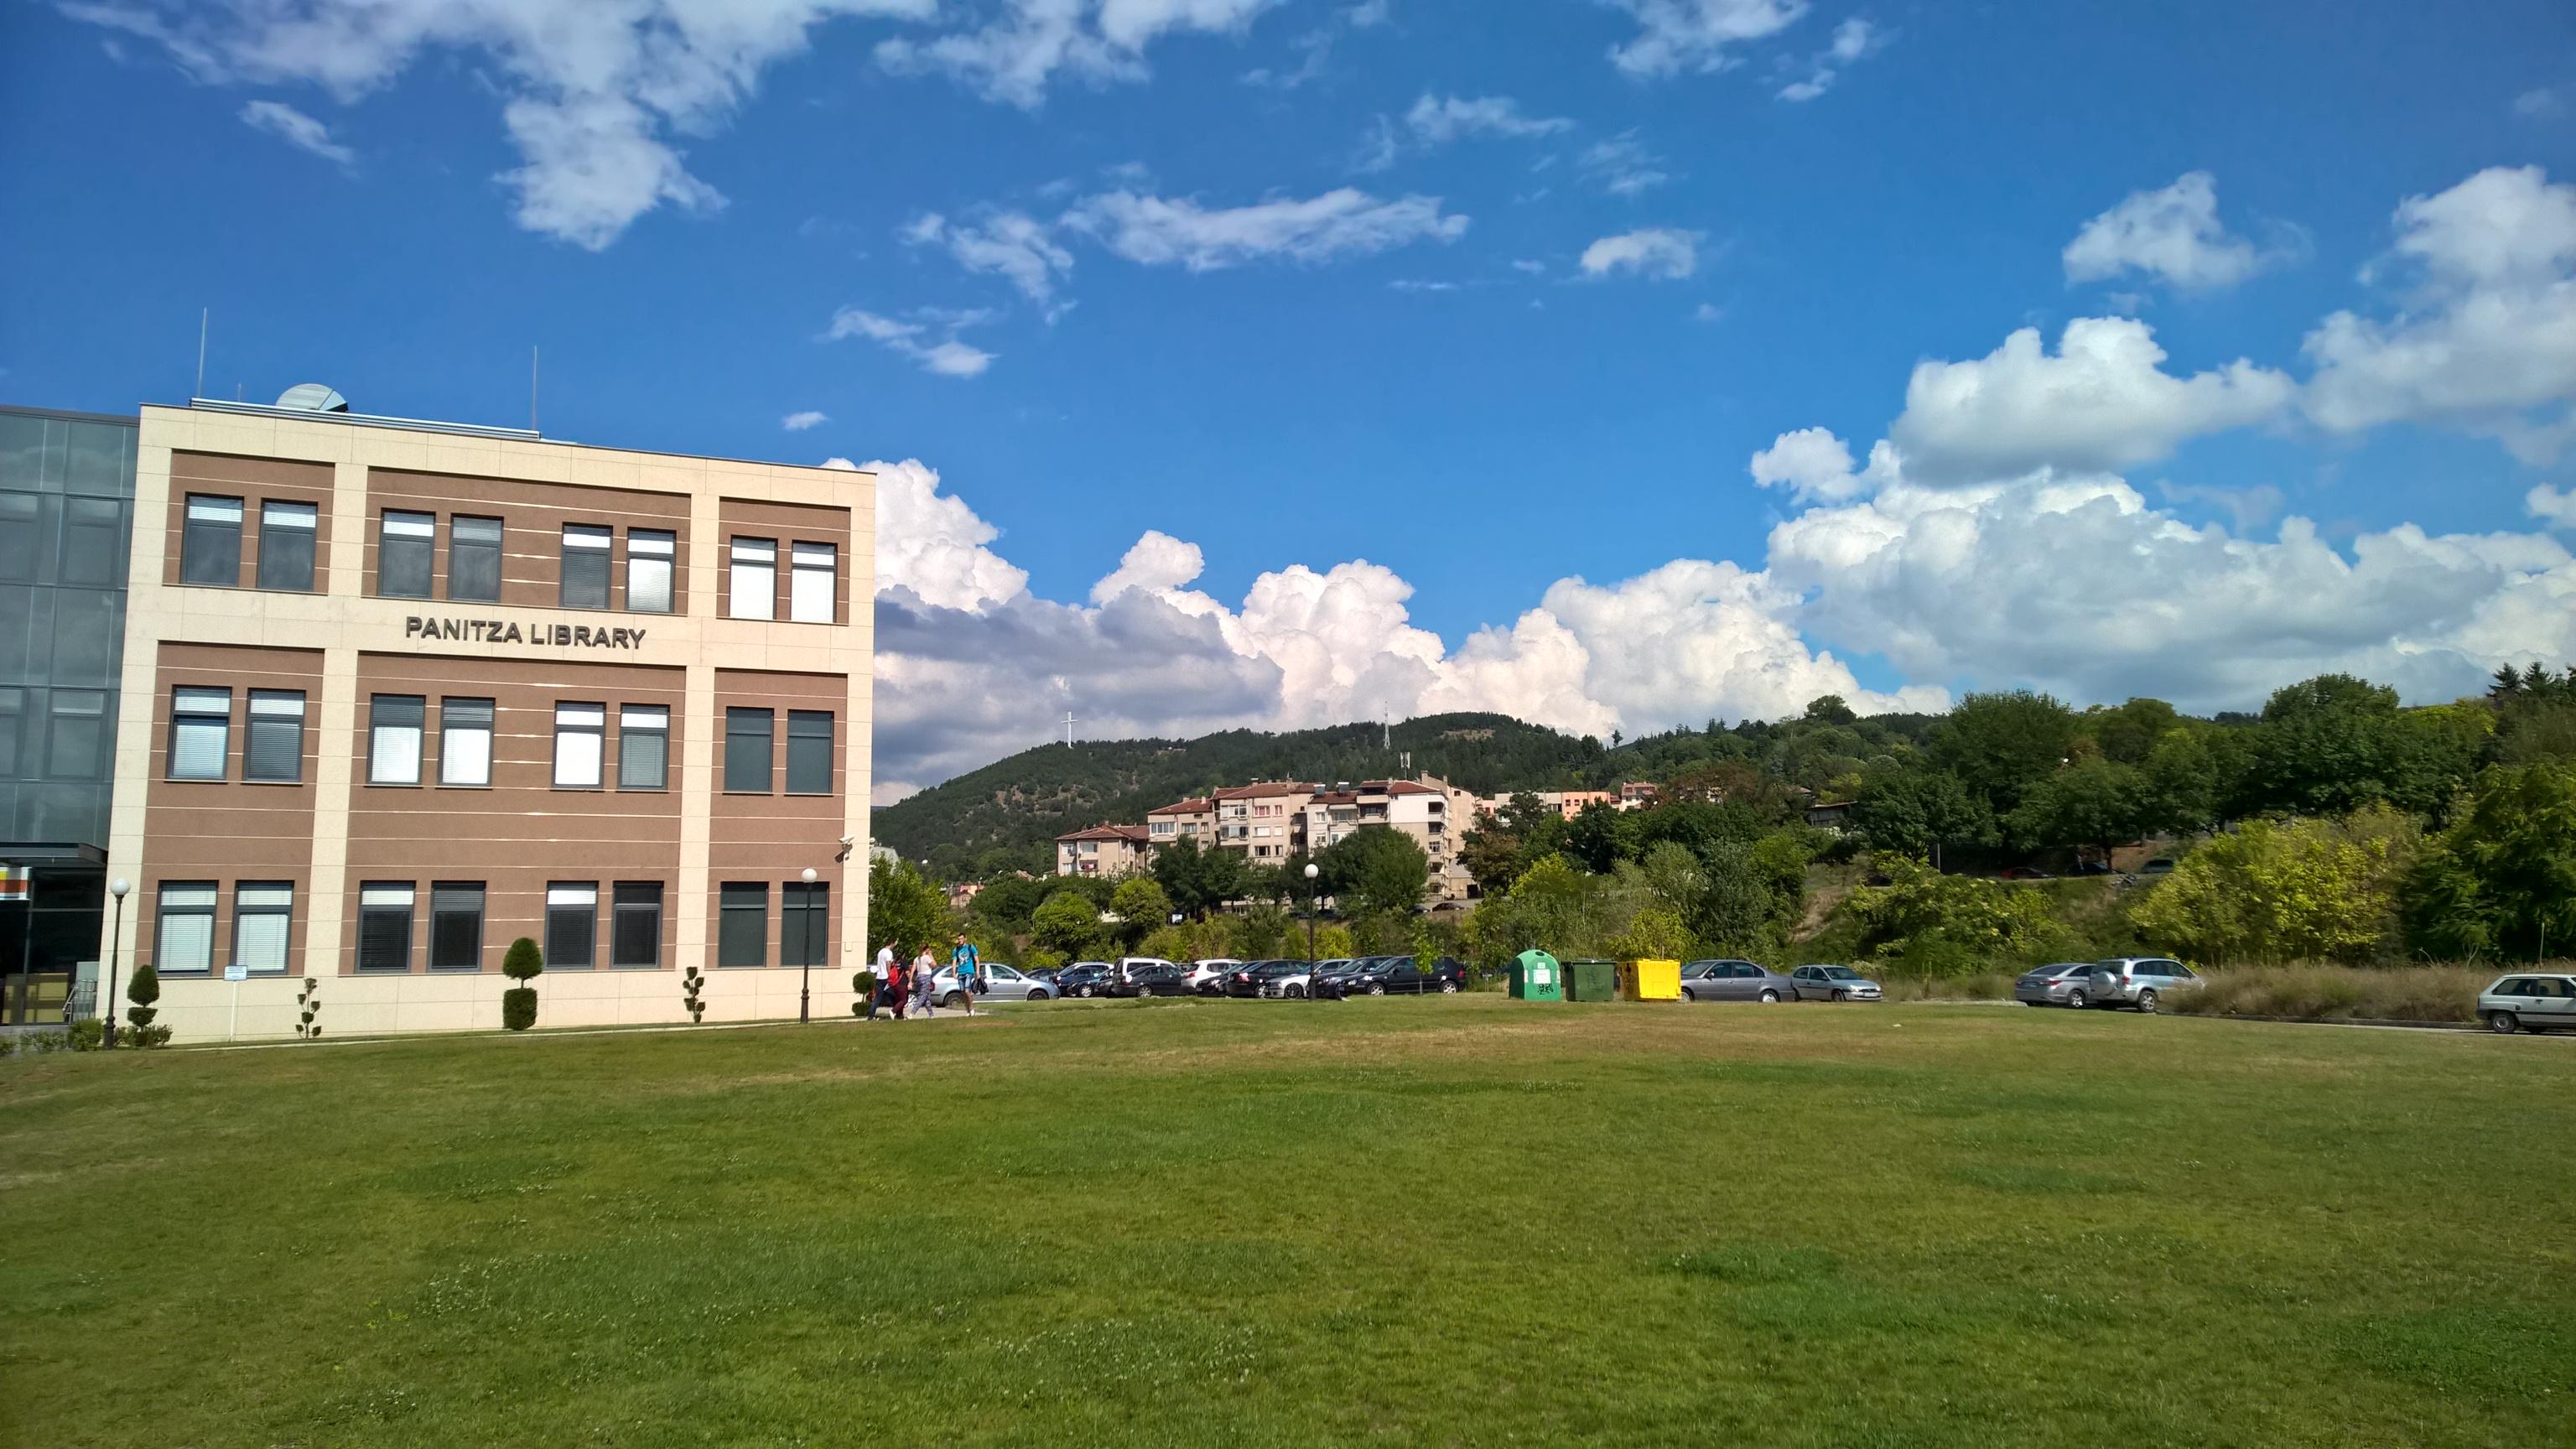 Gutes Wetter heute